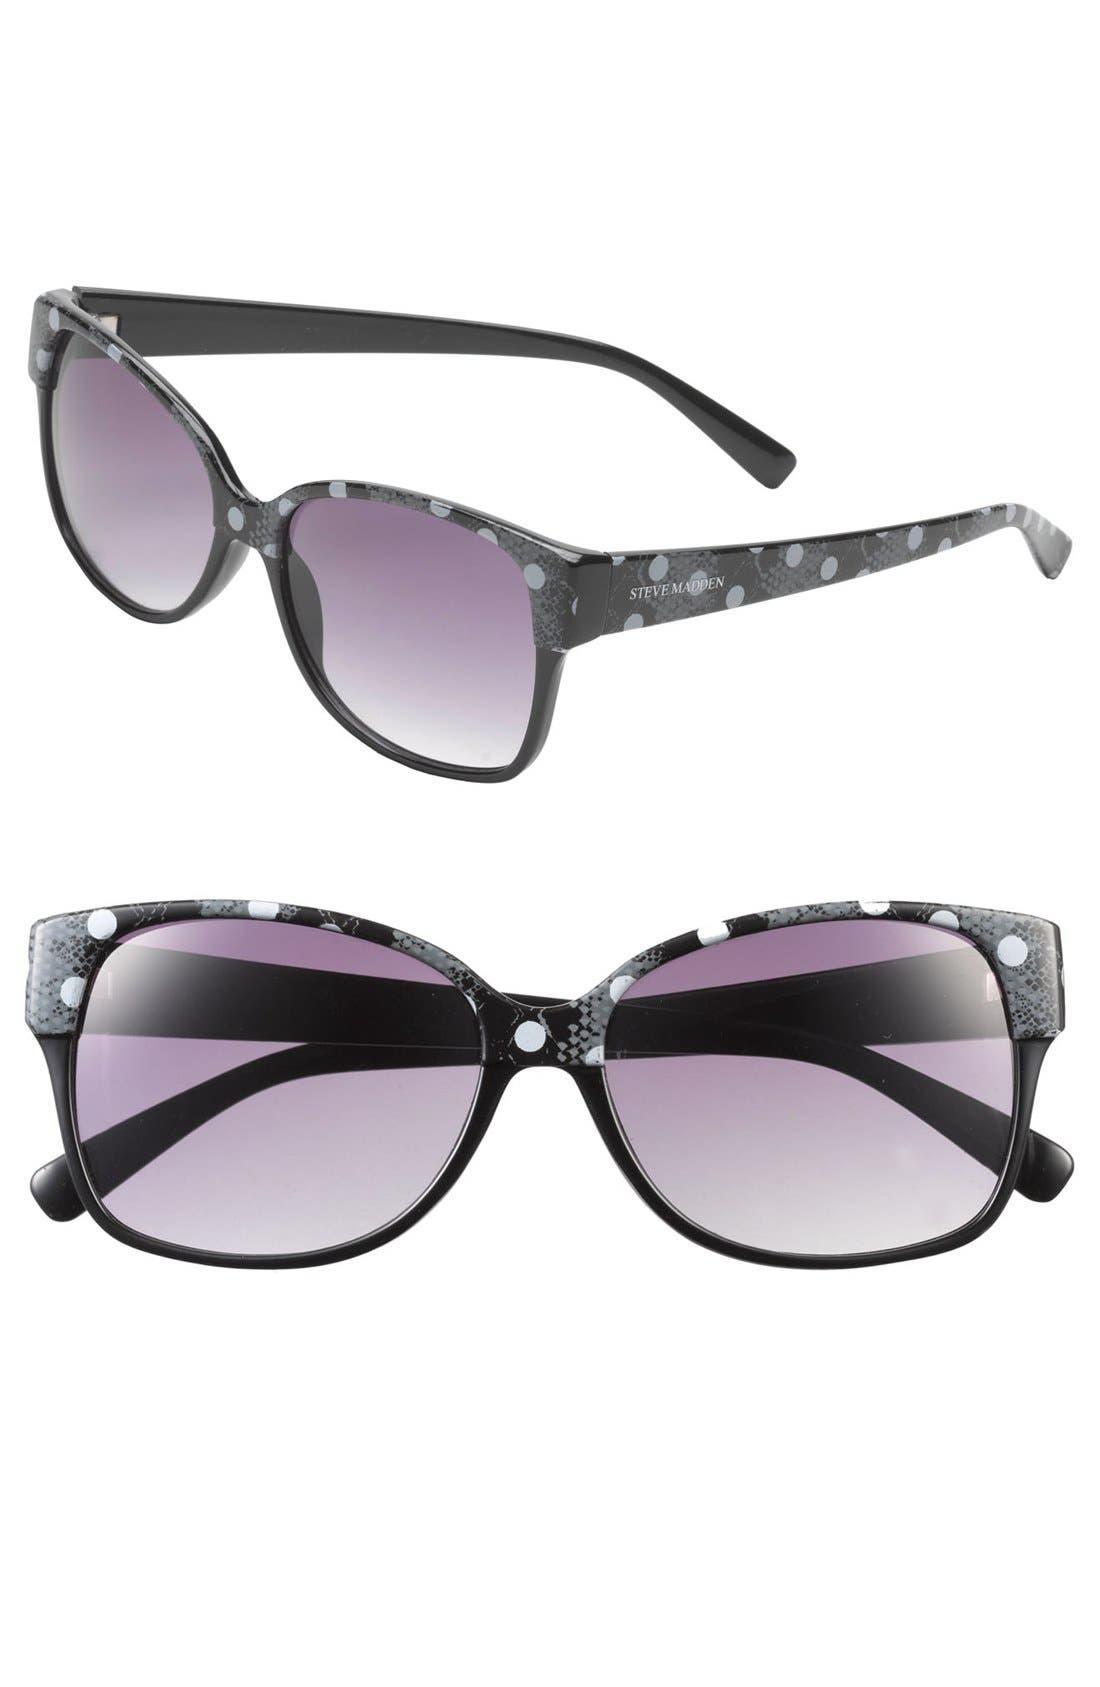 Main Image - Steve Madden Retro Print Sunglasses